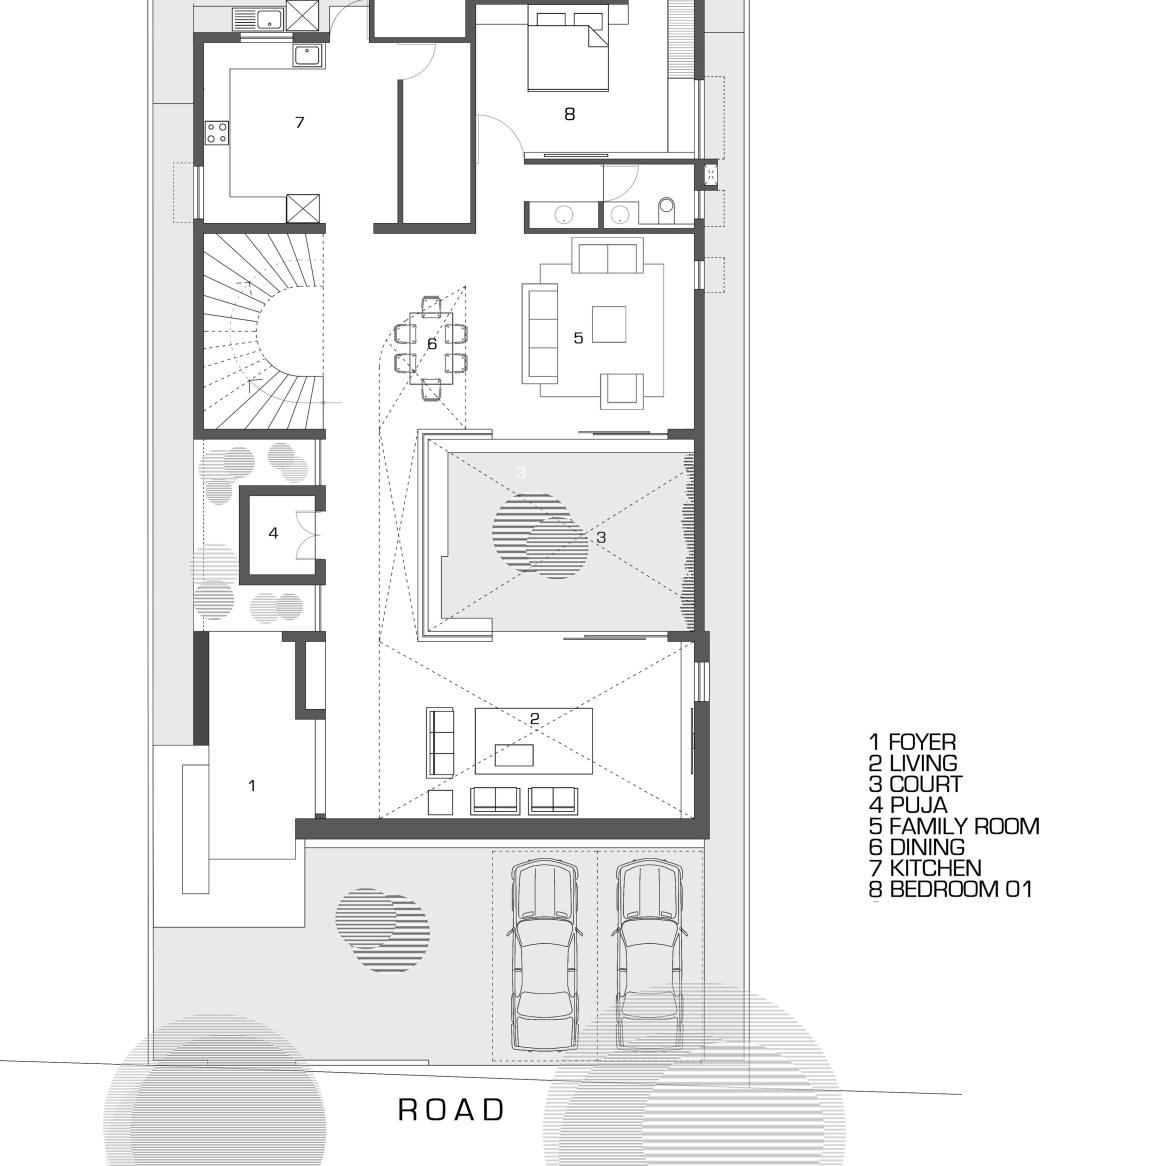 B1-Cadence Architects-Bengaluru-1G